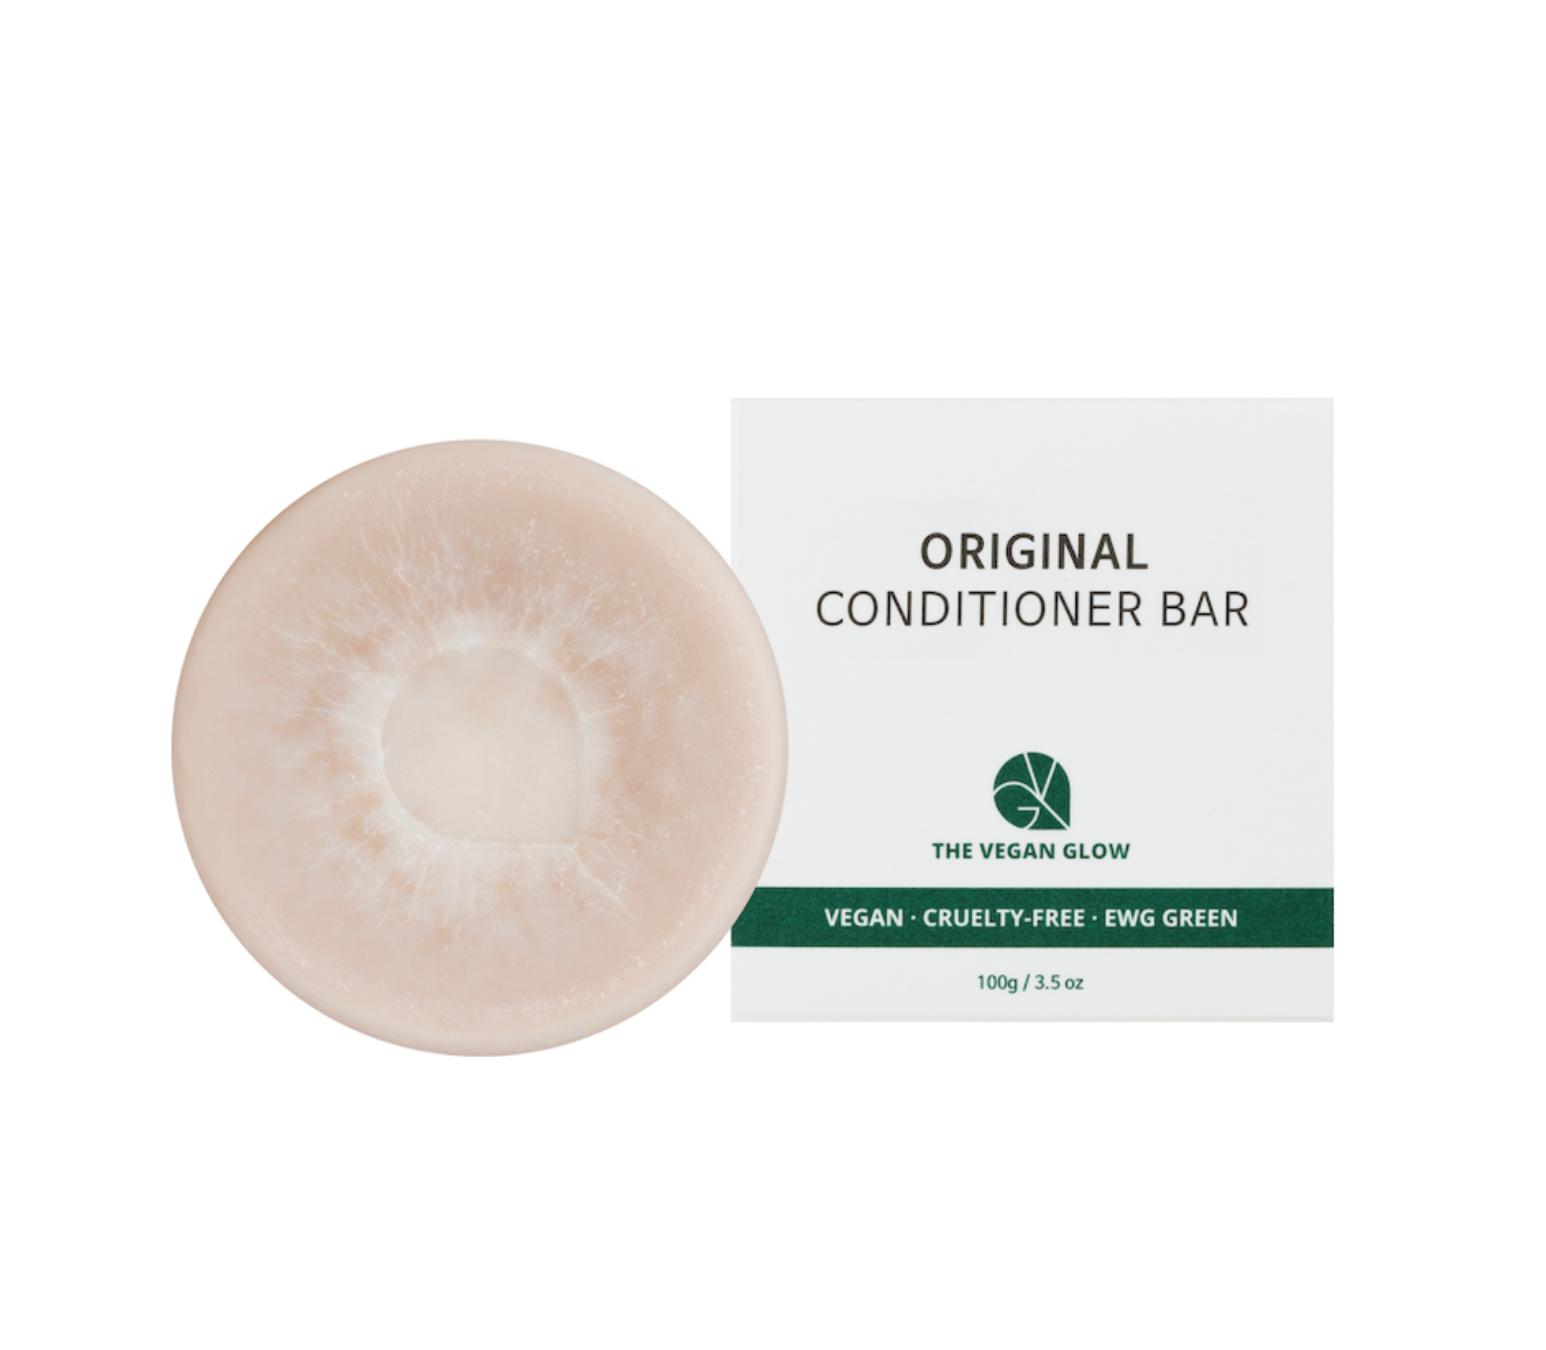 the-vegan-glow-apres-shampoing-solide-Original-Conditioner-Bar-avis-revue